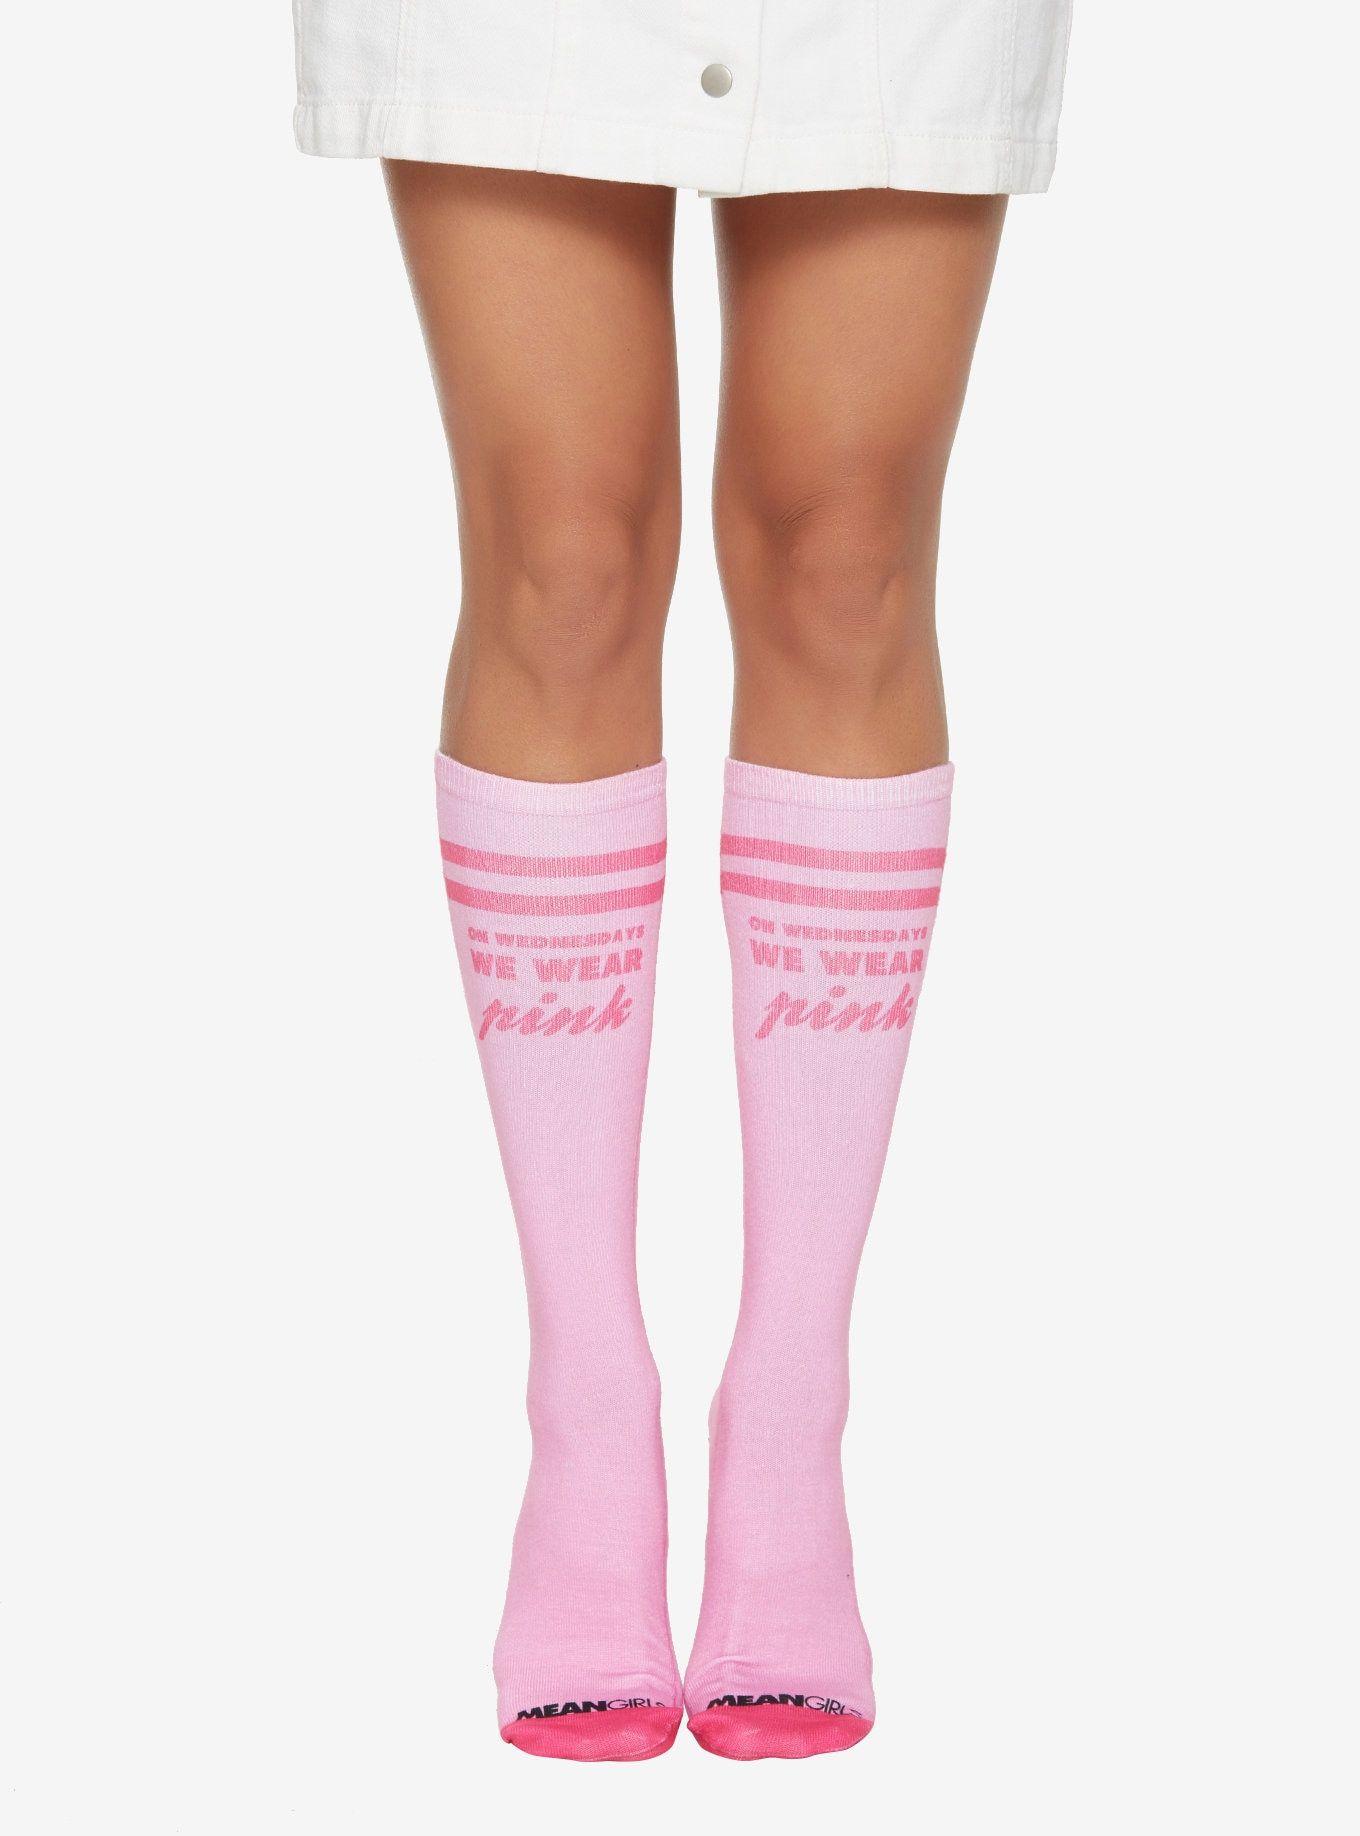 7121fb99d Mean Girls Pink Knee High Socks